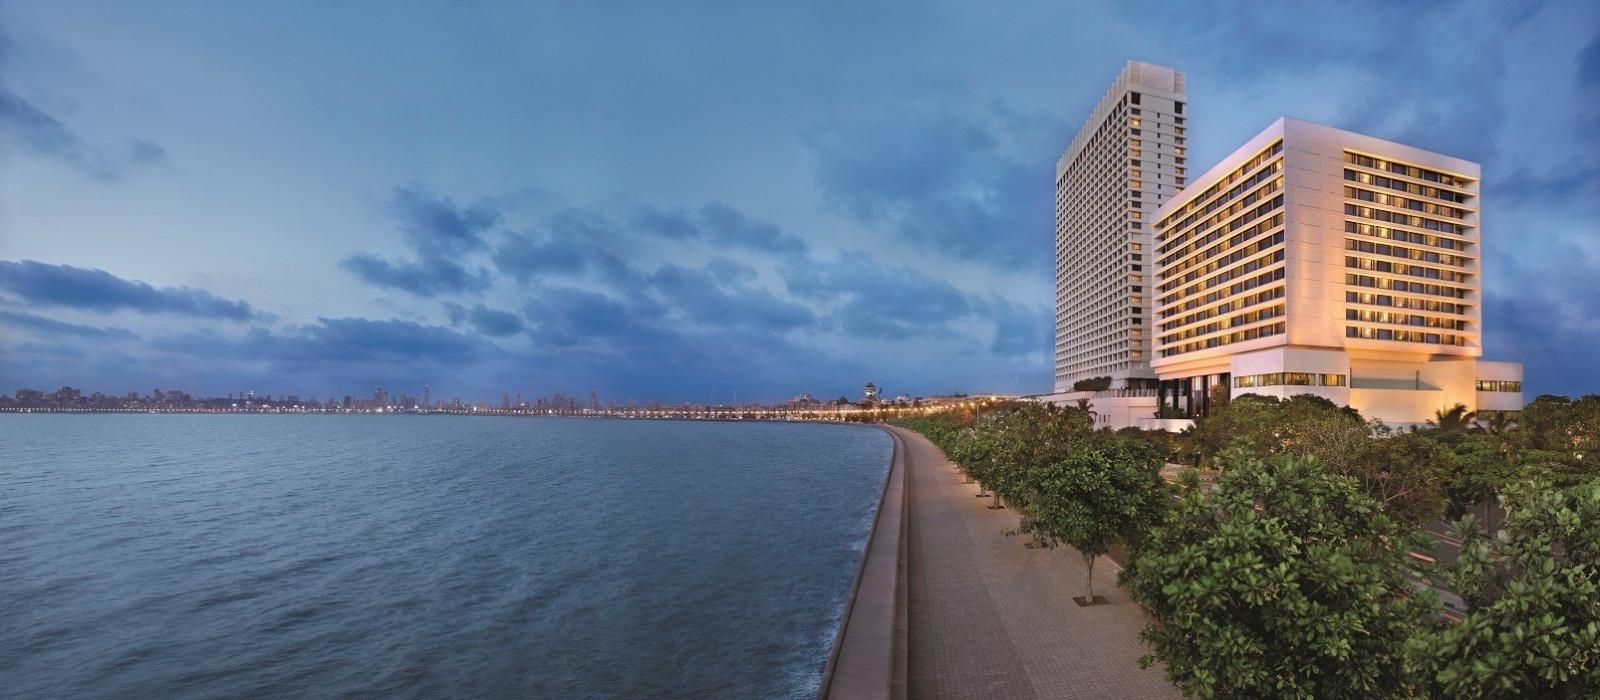 Hotel The Oberoi, Mumbai Central & West India